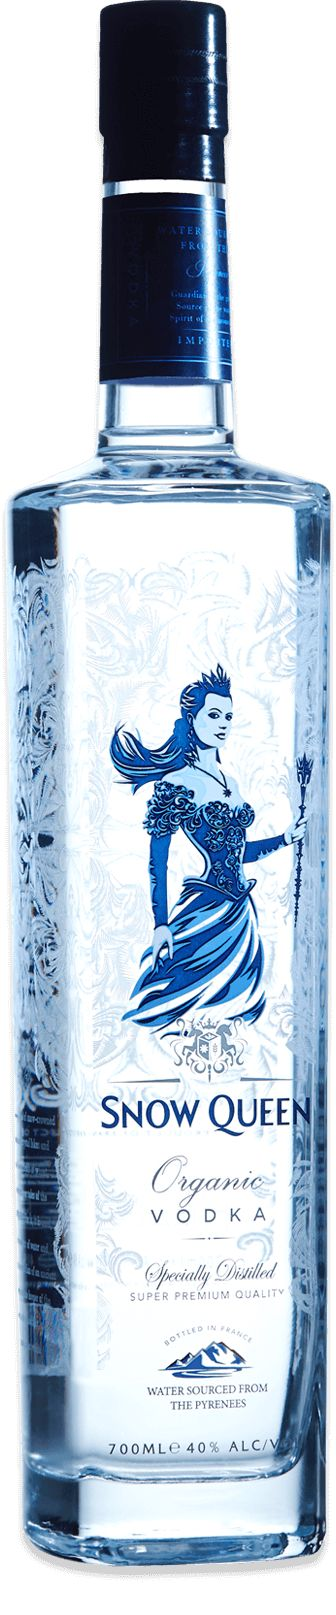 Snow Queen Vodka – Vodka Bottle